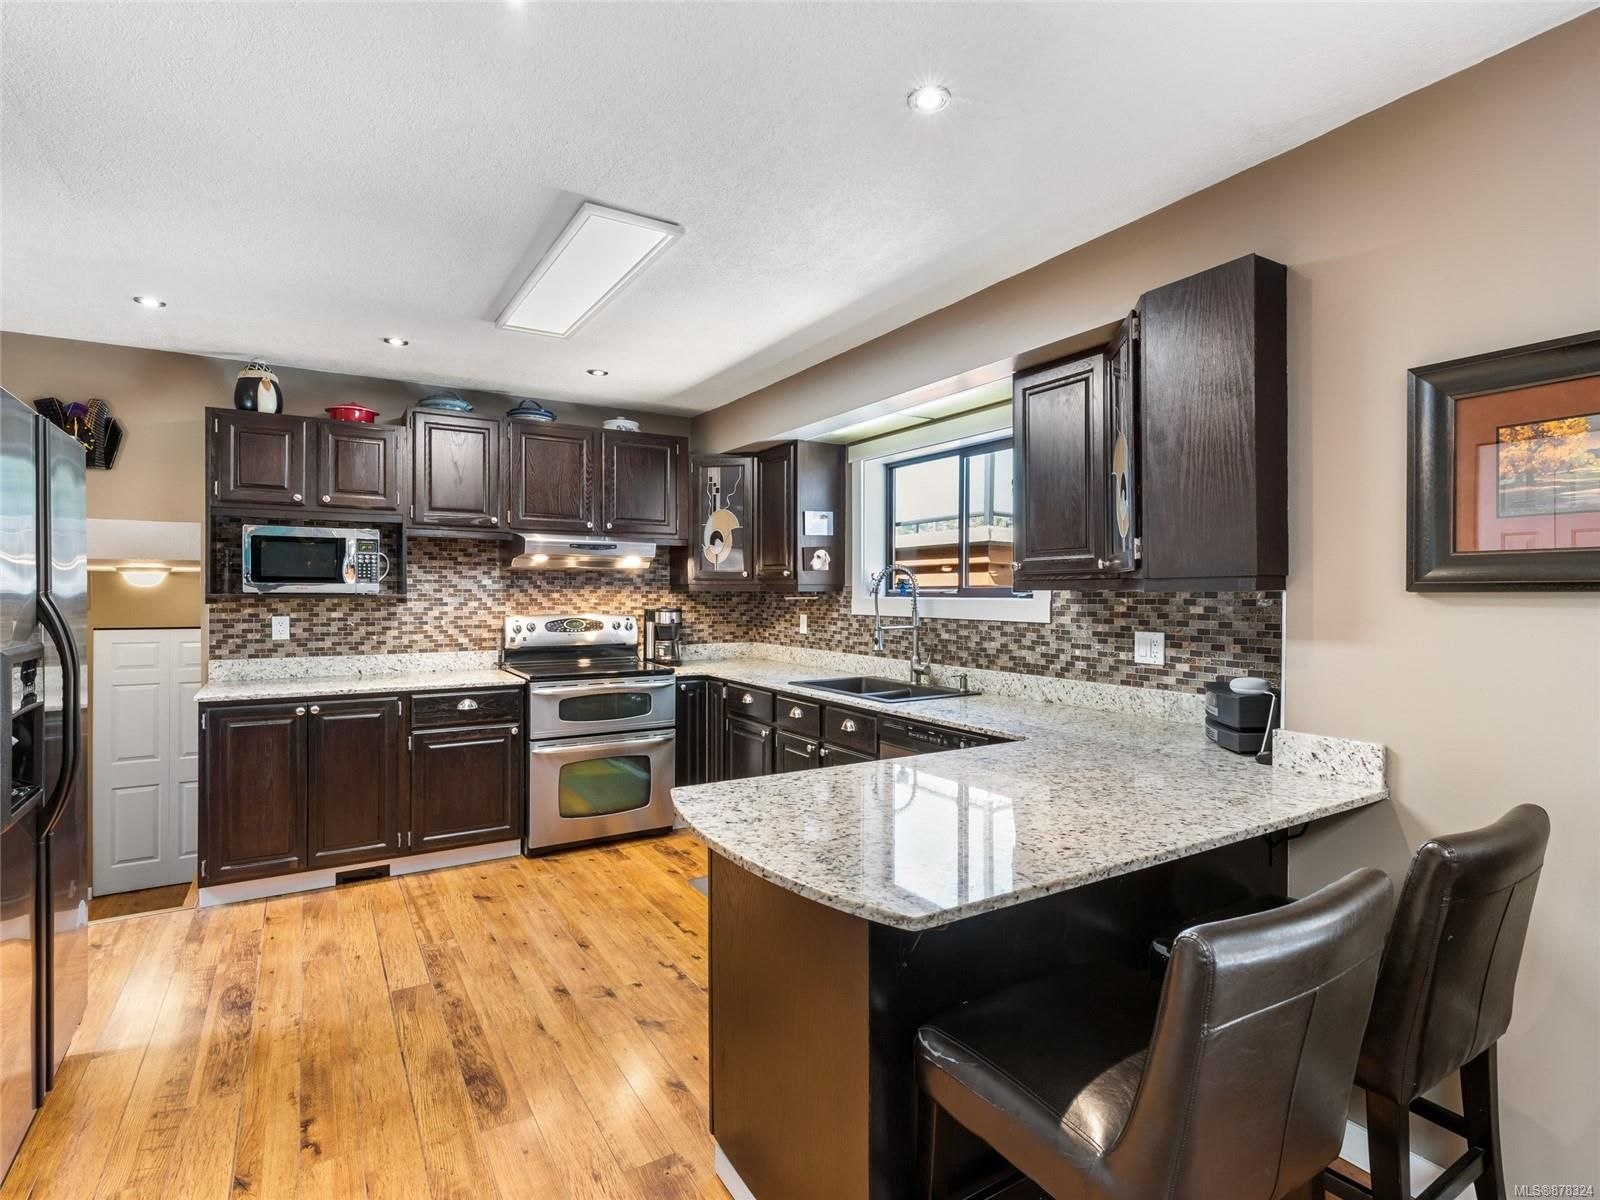 Photo 11: Photos: 3875 Moore Rd in : PA Port Alberni House for sale (Port Alberni)  : MLS®# 878324